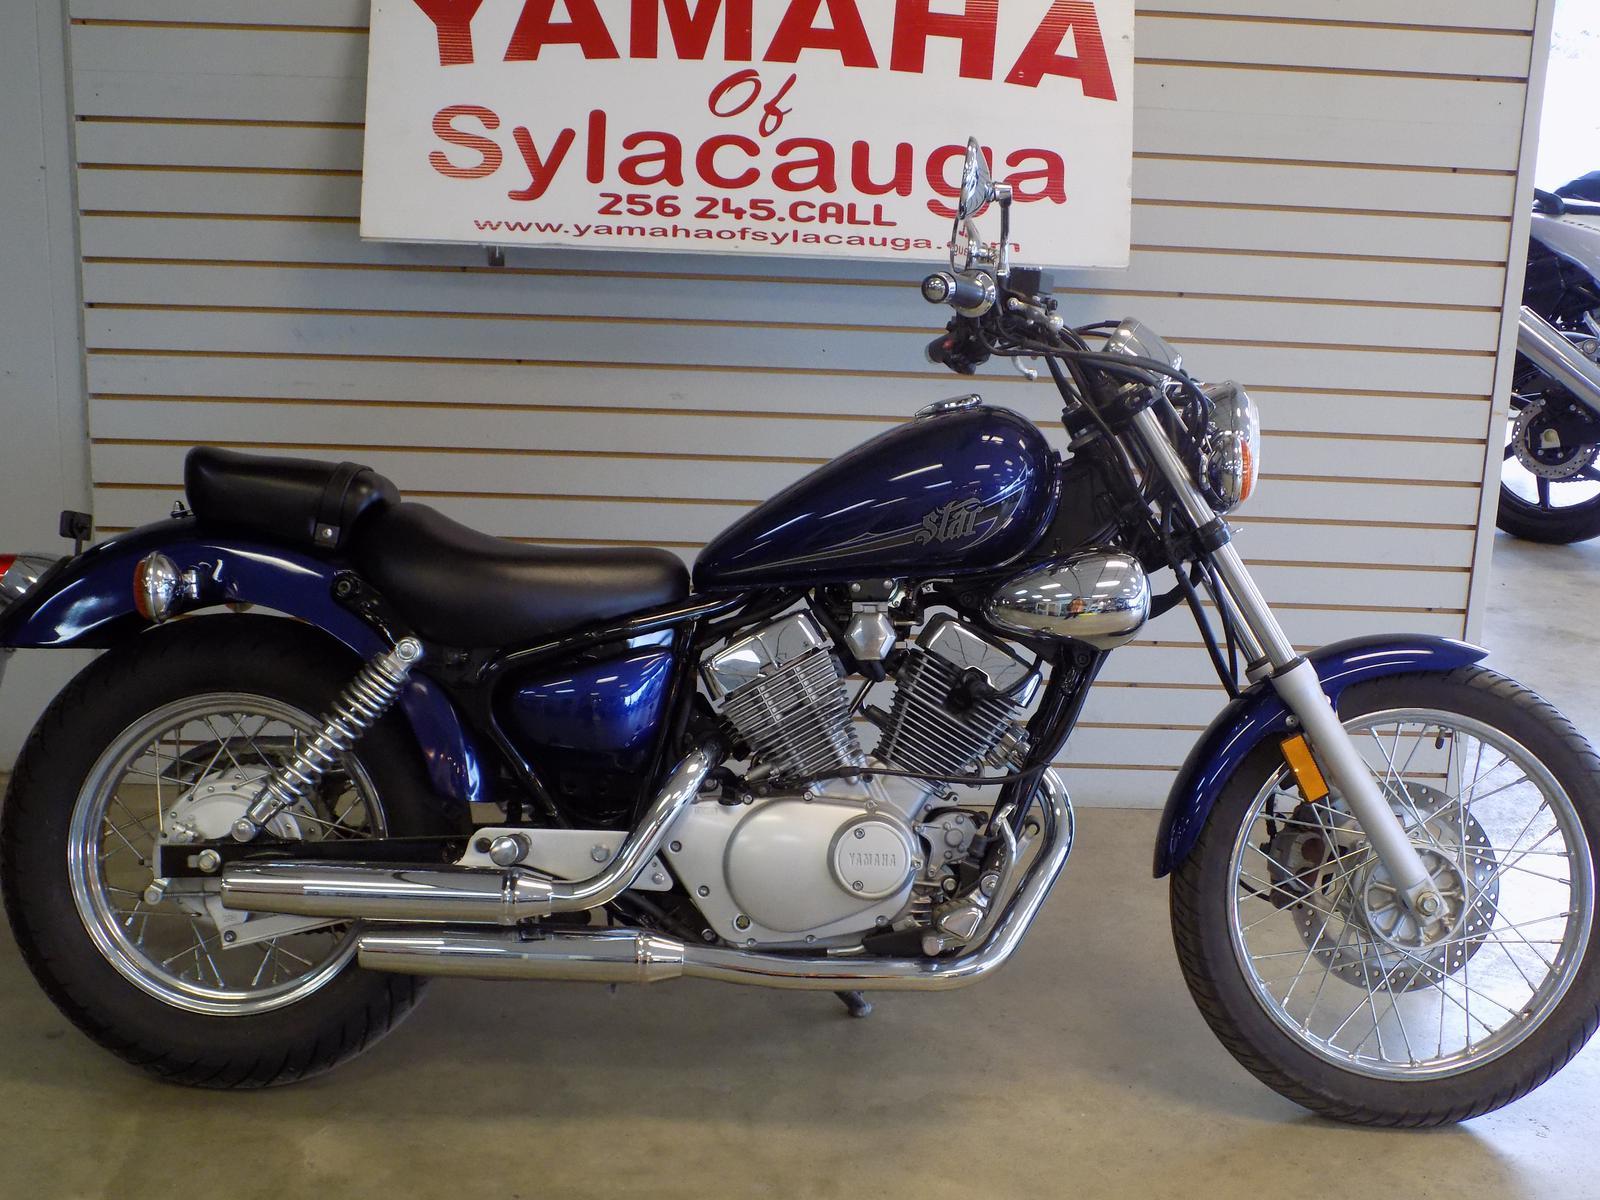 2013 Yamaha Vstar 250 for sale in Sylacauga, AL   Yamaha of ...